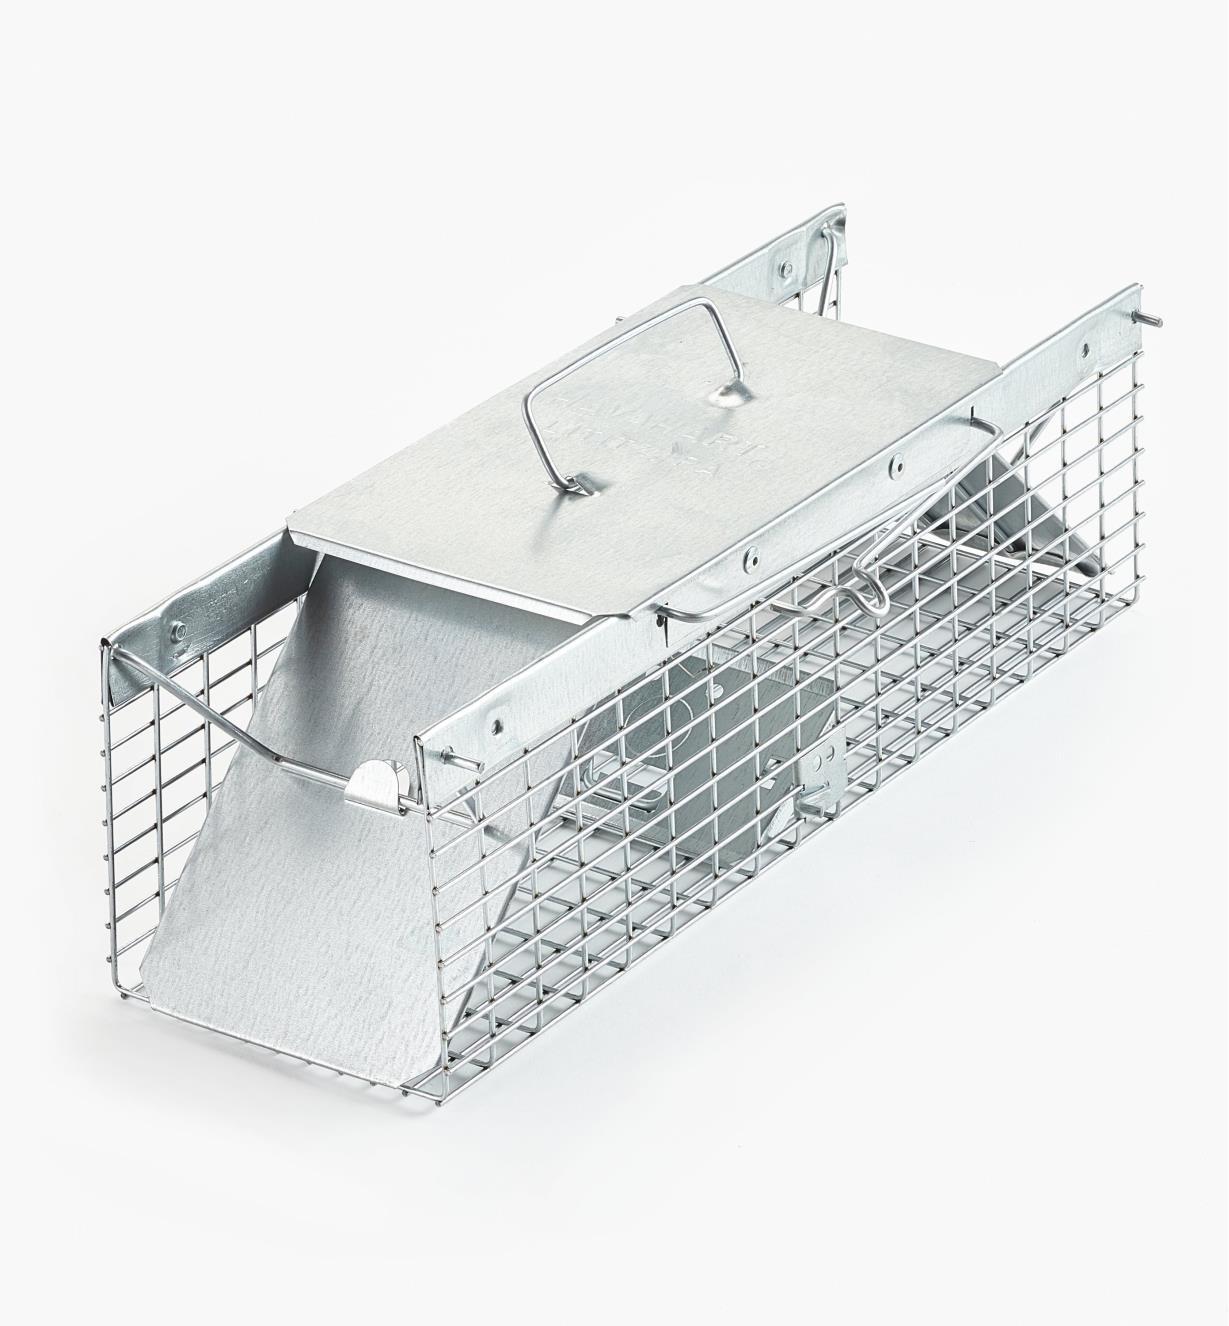 XM197 - Havahart Chipmunk Trap